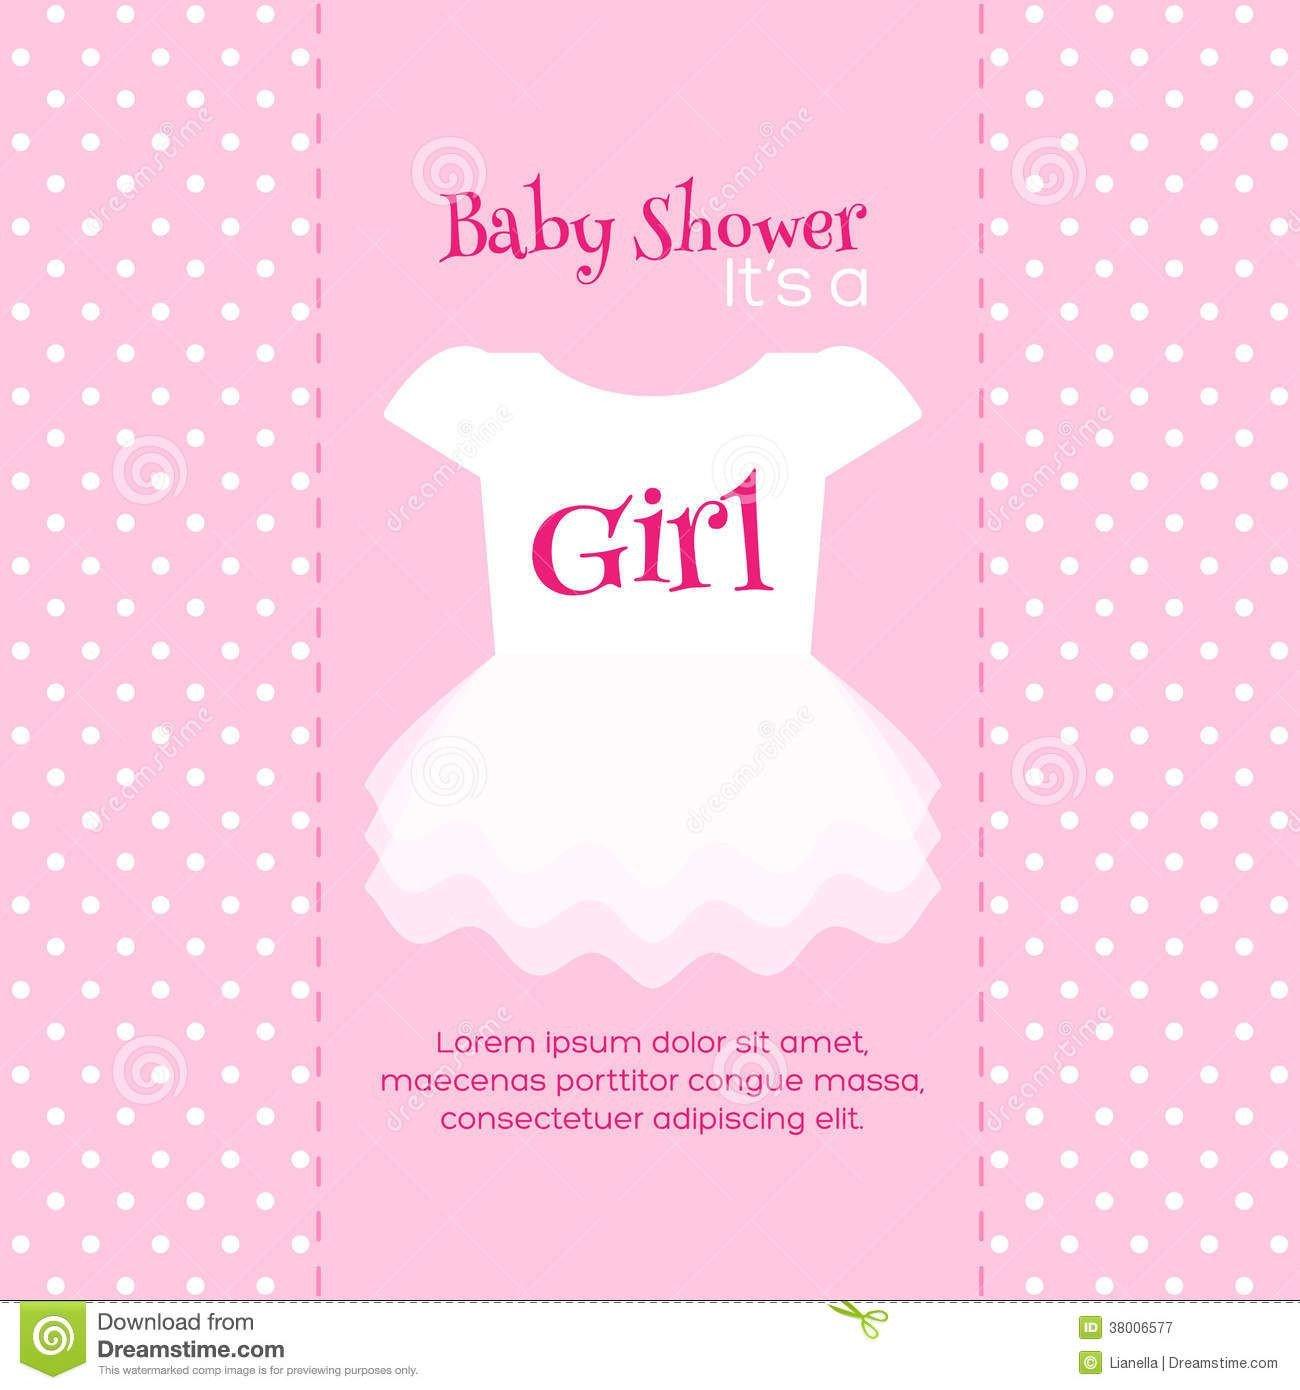 Baby Shower Invitation Free Template Design Free Printable Baby Shower Invitations for Girls